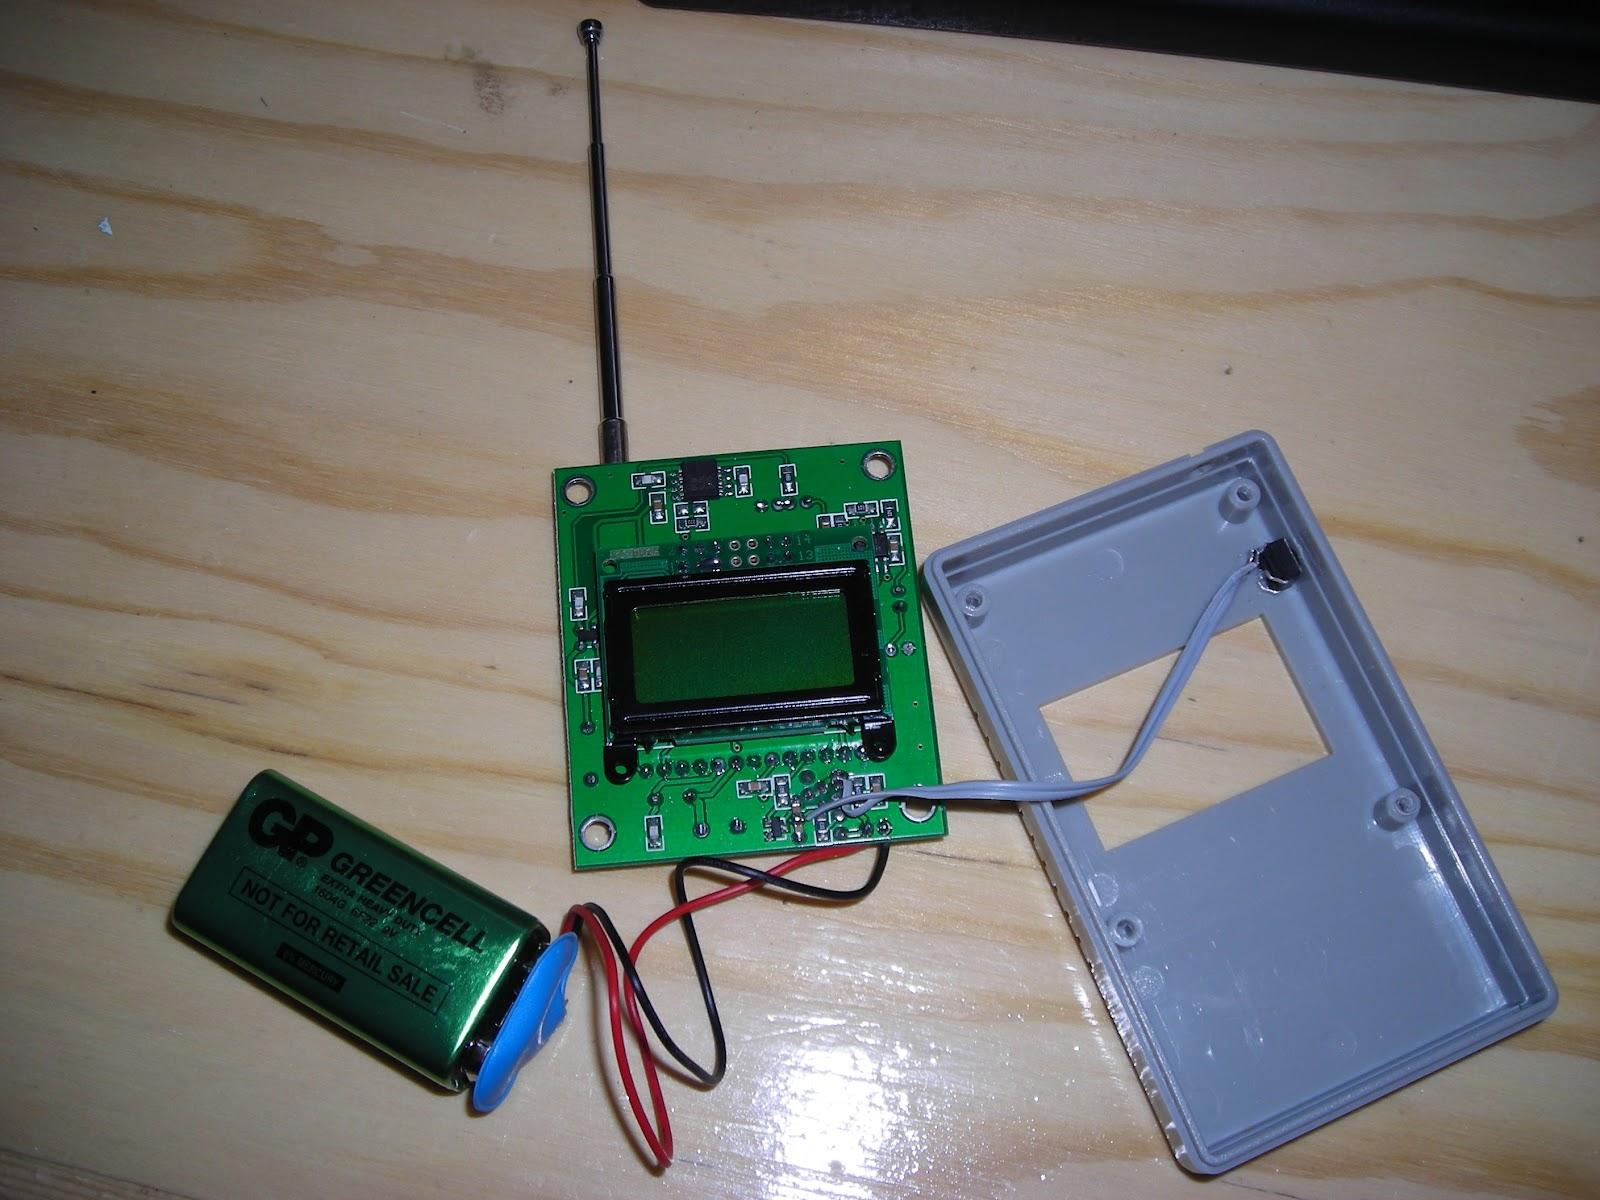 M1ktas Qrp Ham Radio Blog Gy560 Frequency Counter Home Fun Circuits June 2012